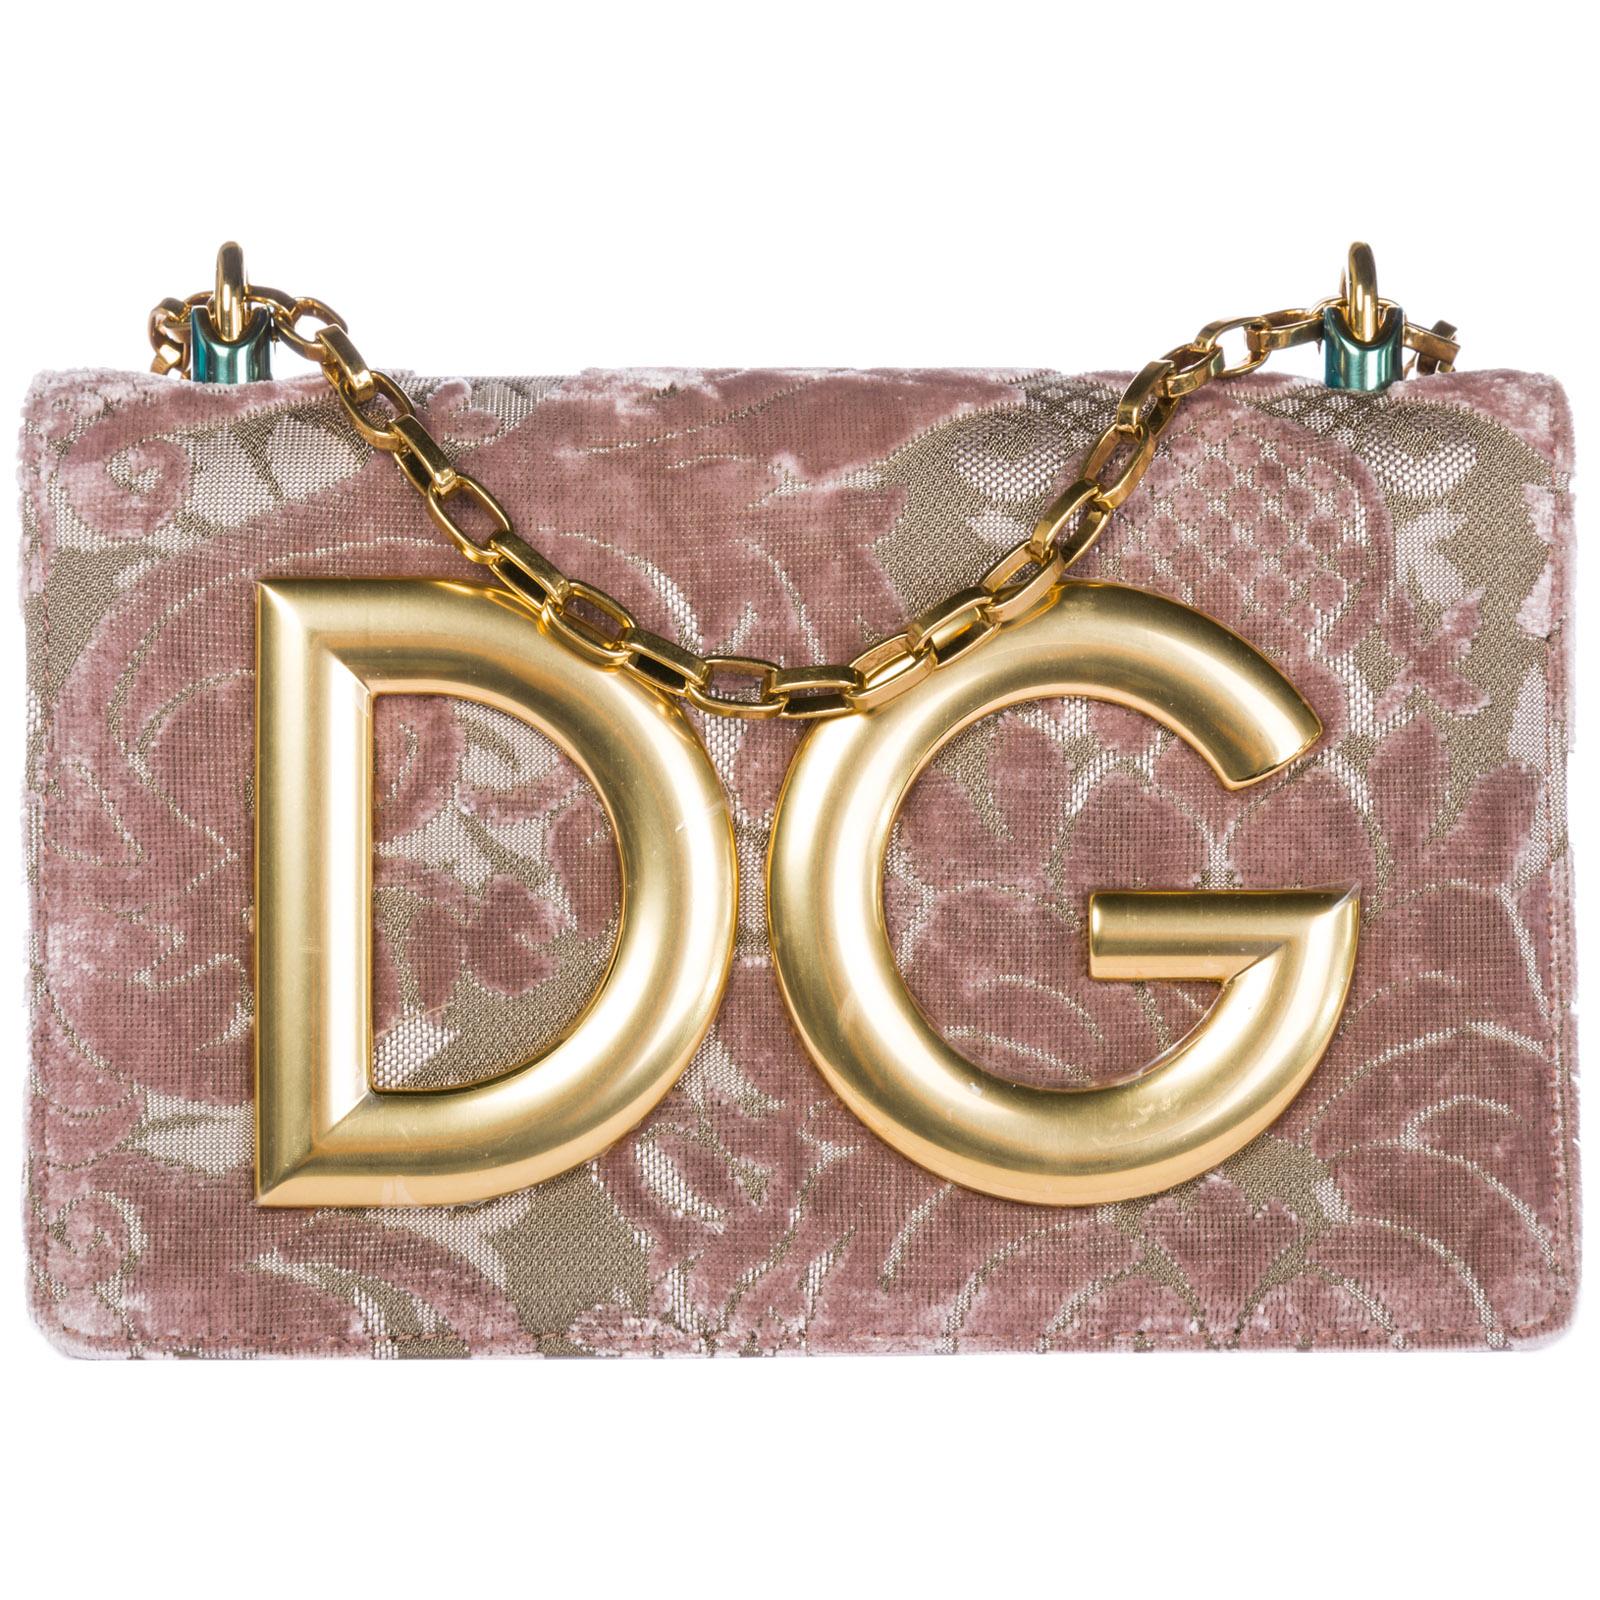 faabf8c640 Women s leather cross-body messenger shoulder bag dg girls ...